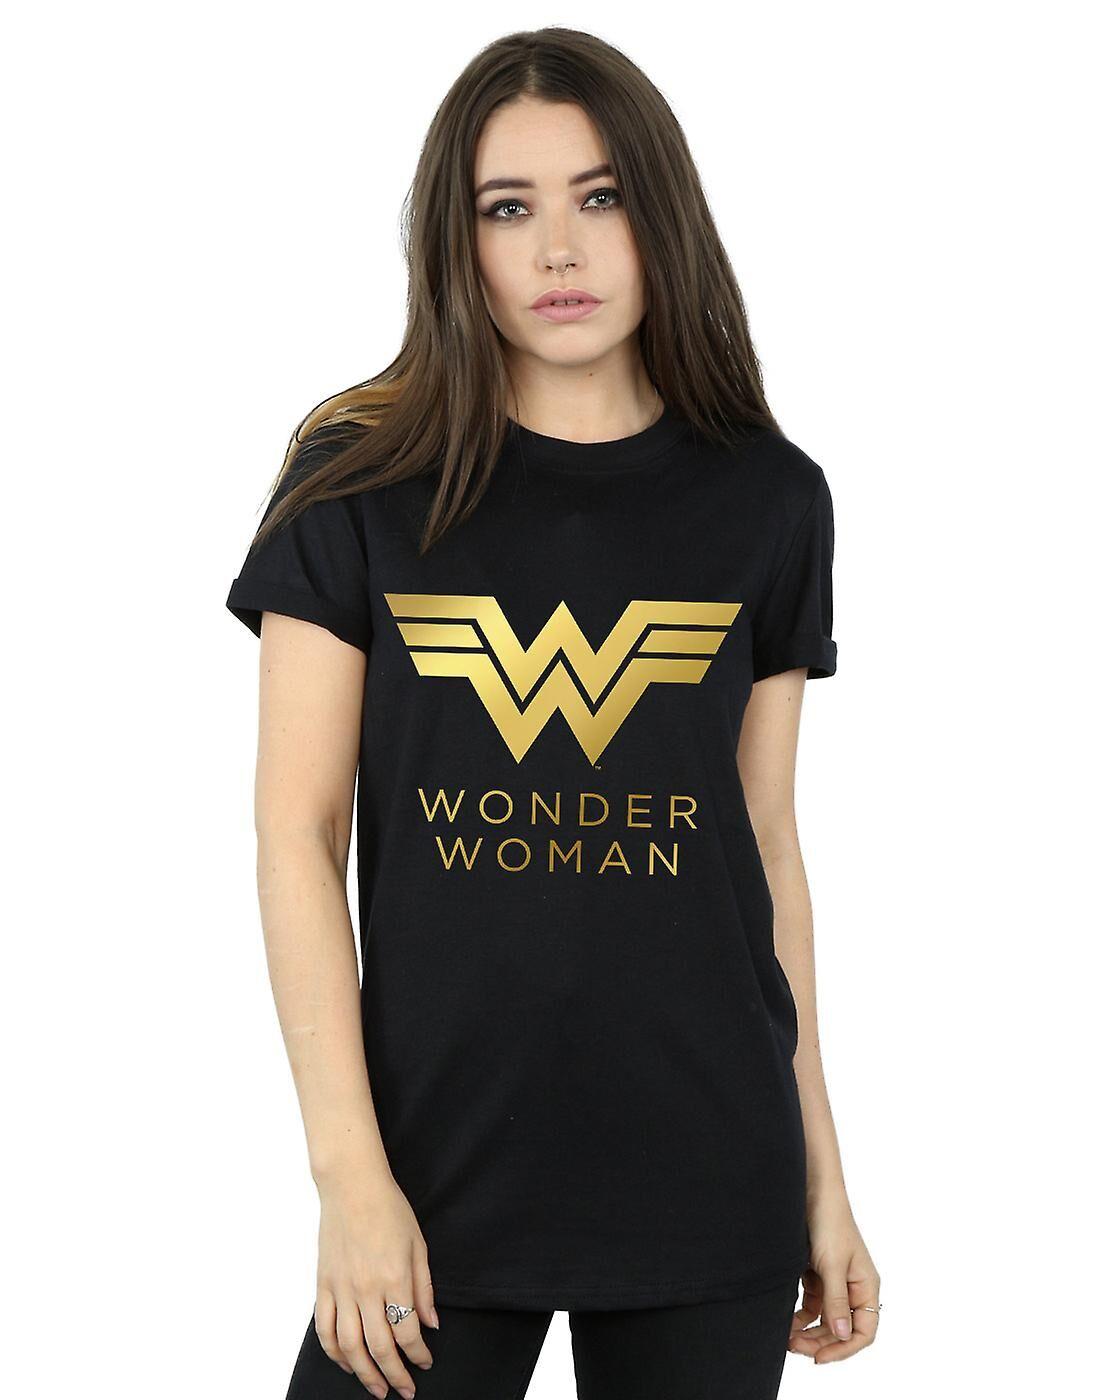 Absolute Cult DC Comics Femmes-apos;s Wonder Woman 84 Golden Logo Boyfriend Fit T-Shirt Blanc XXXXX-Large